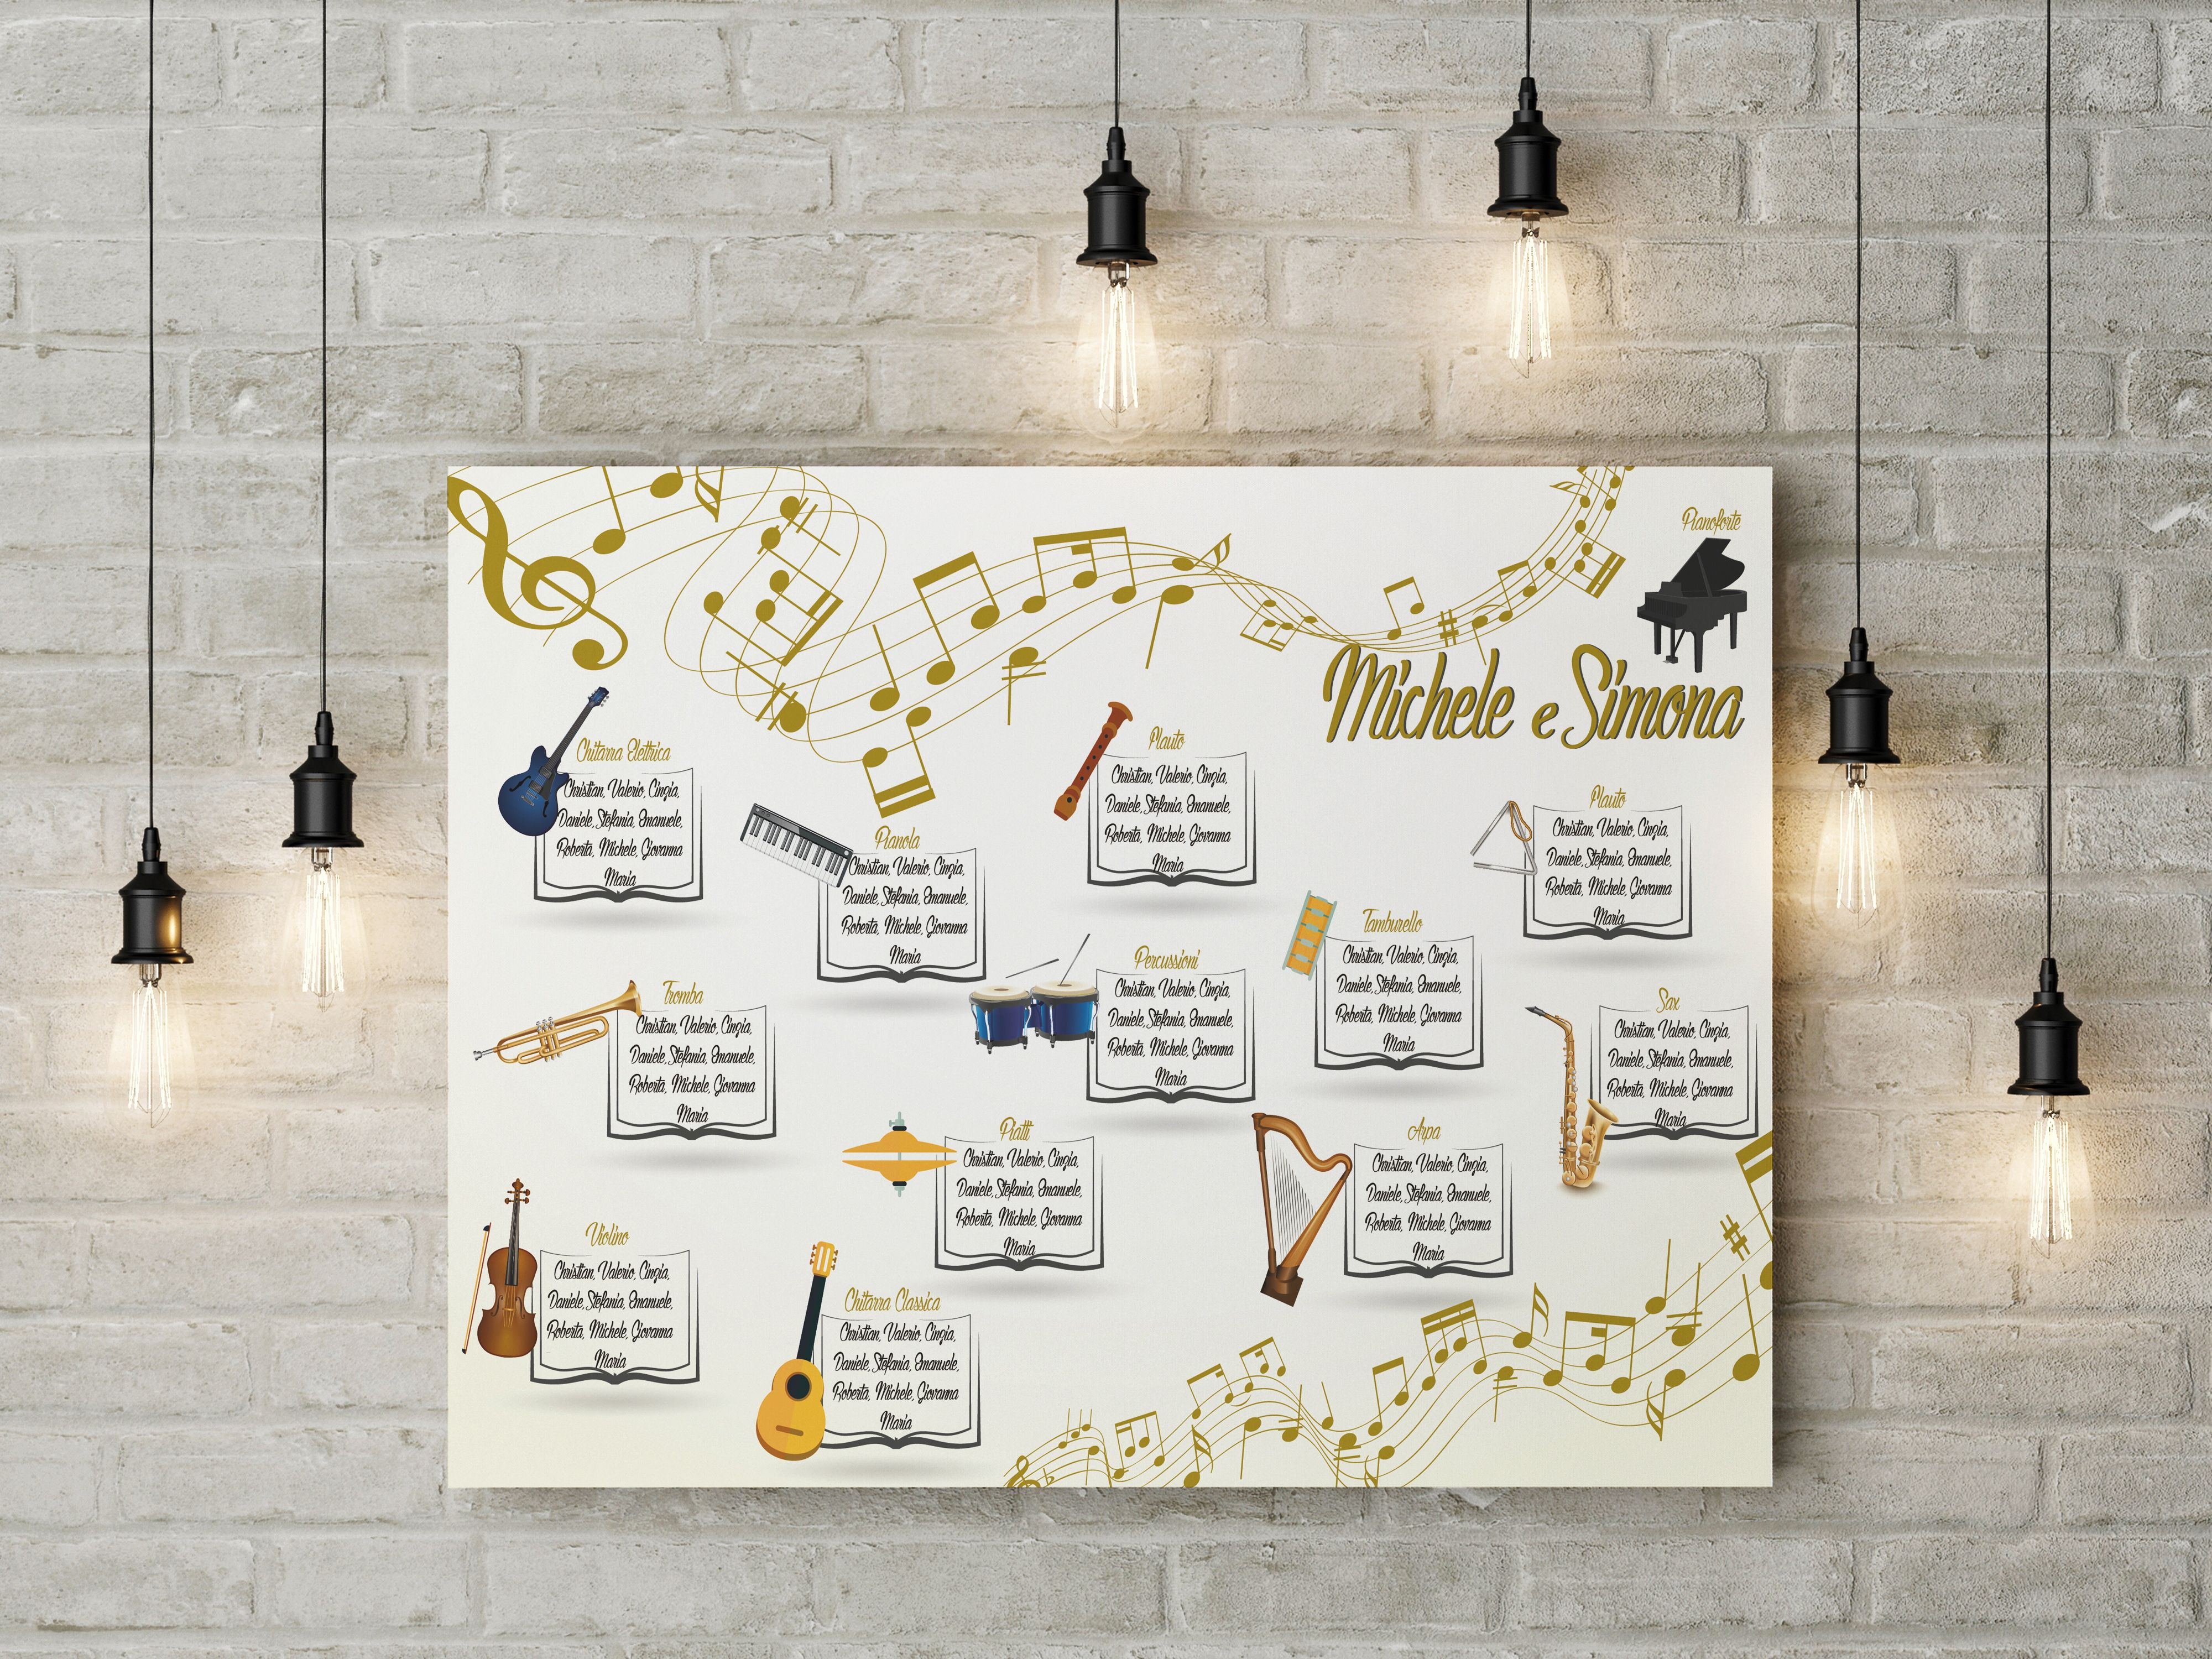 Matrimonio Tema Arte : Tableau de marriage a tema strumenti musicali grafica